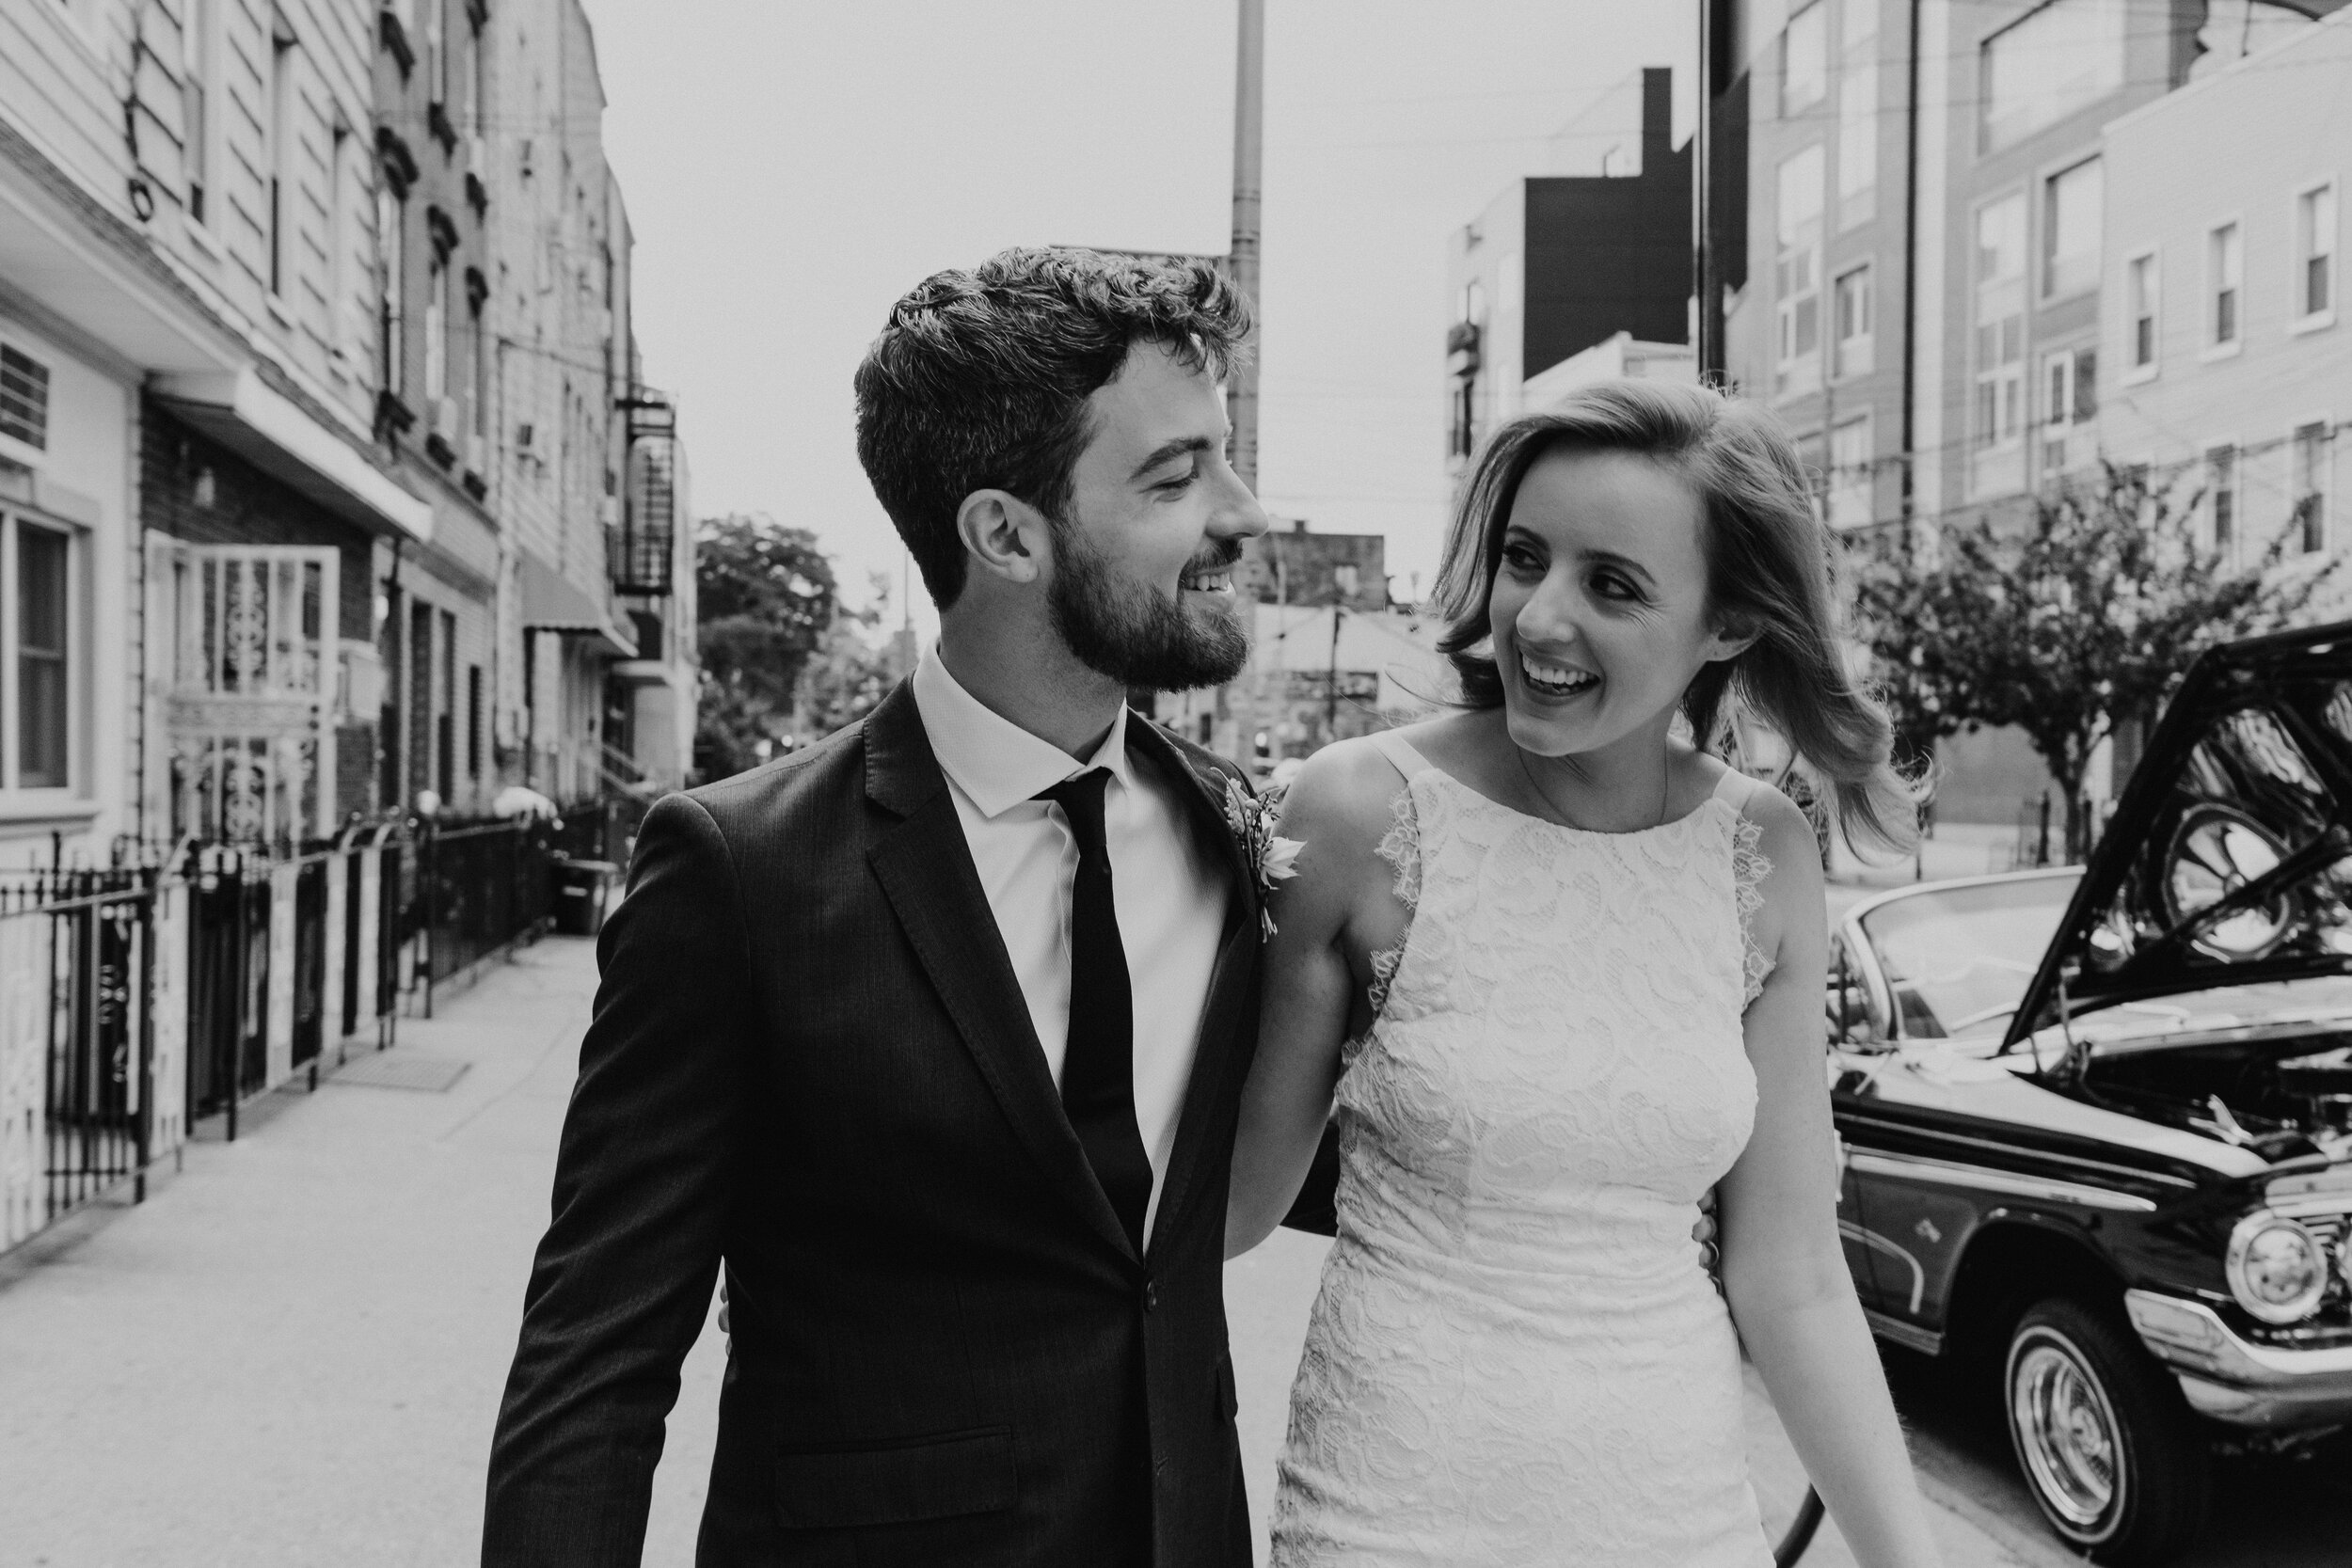 Aurora_Brooklyn_Wedding_Photographer_Chellise_Michael_Photography-134.jpg